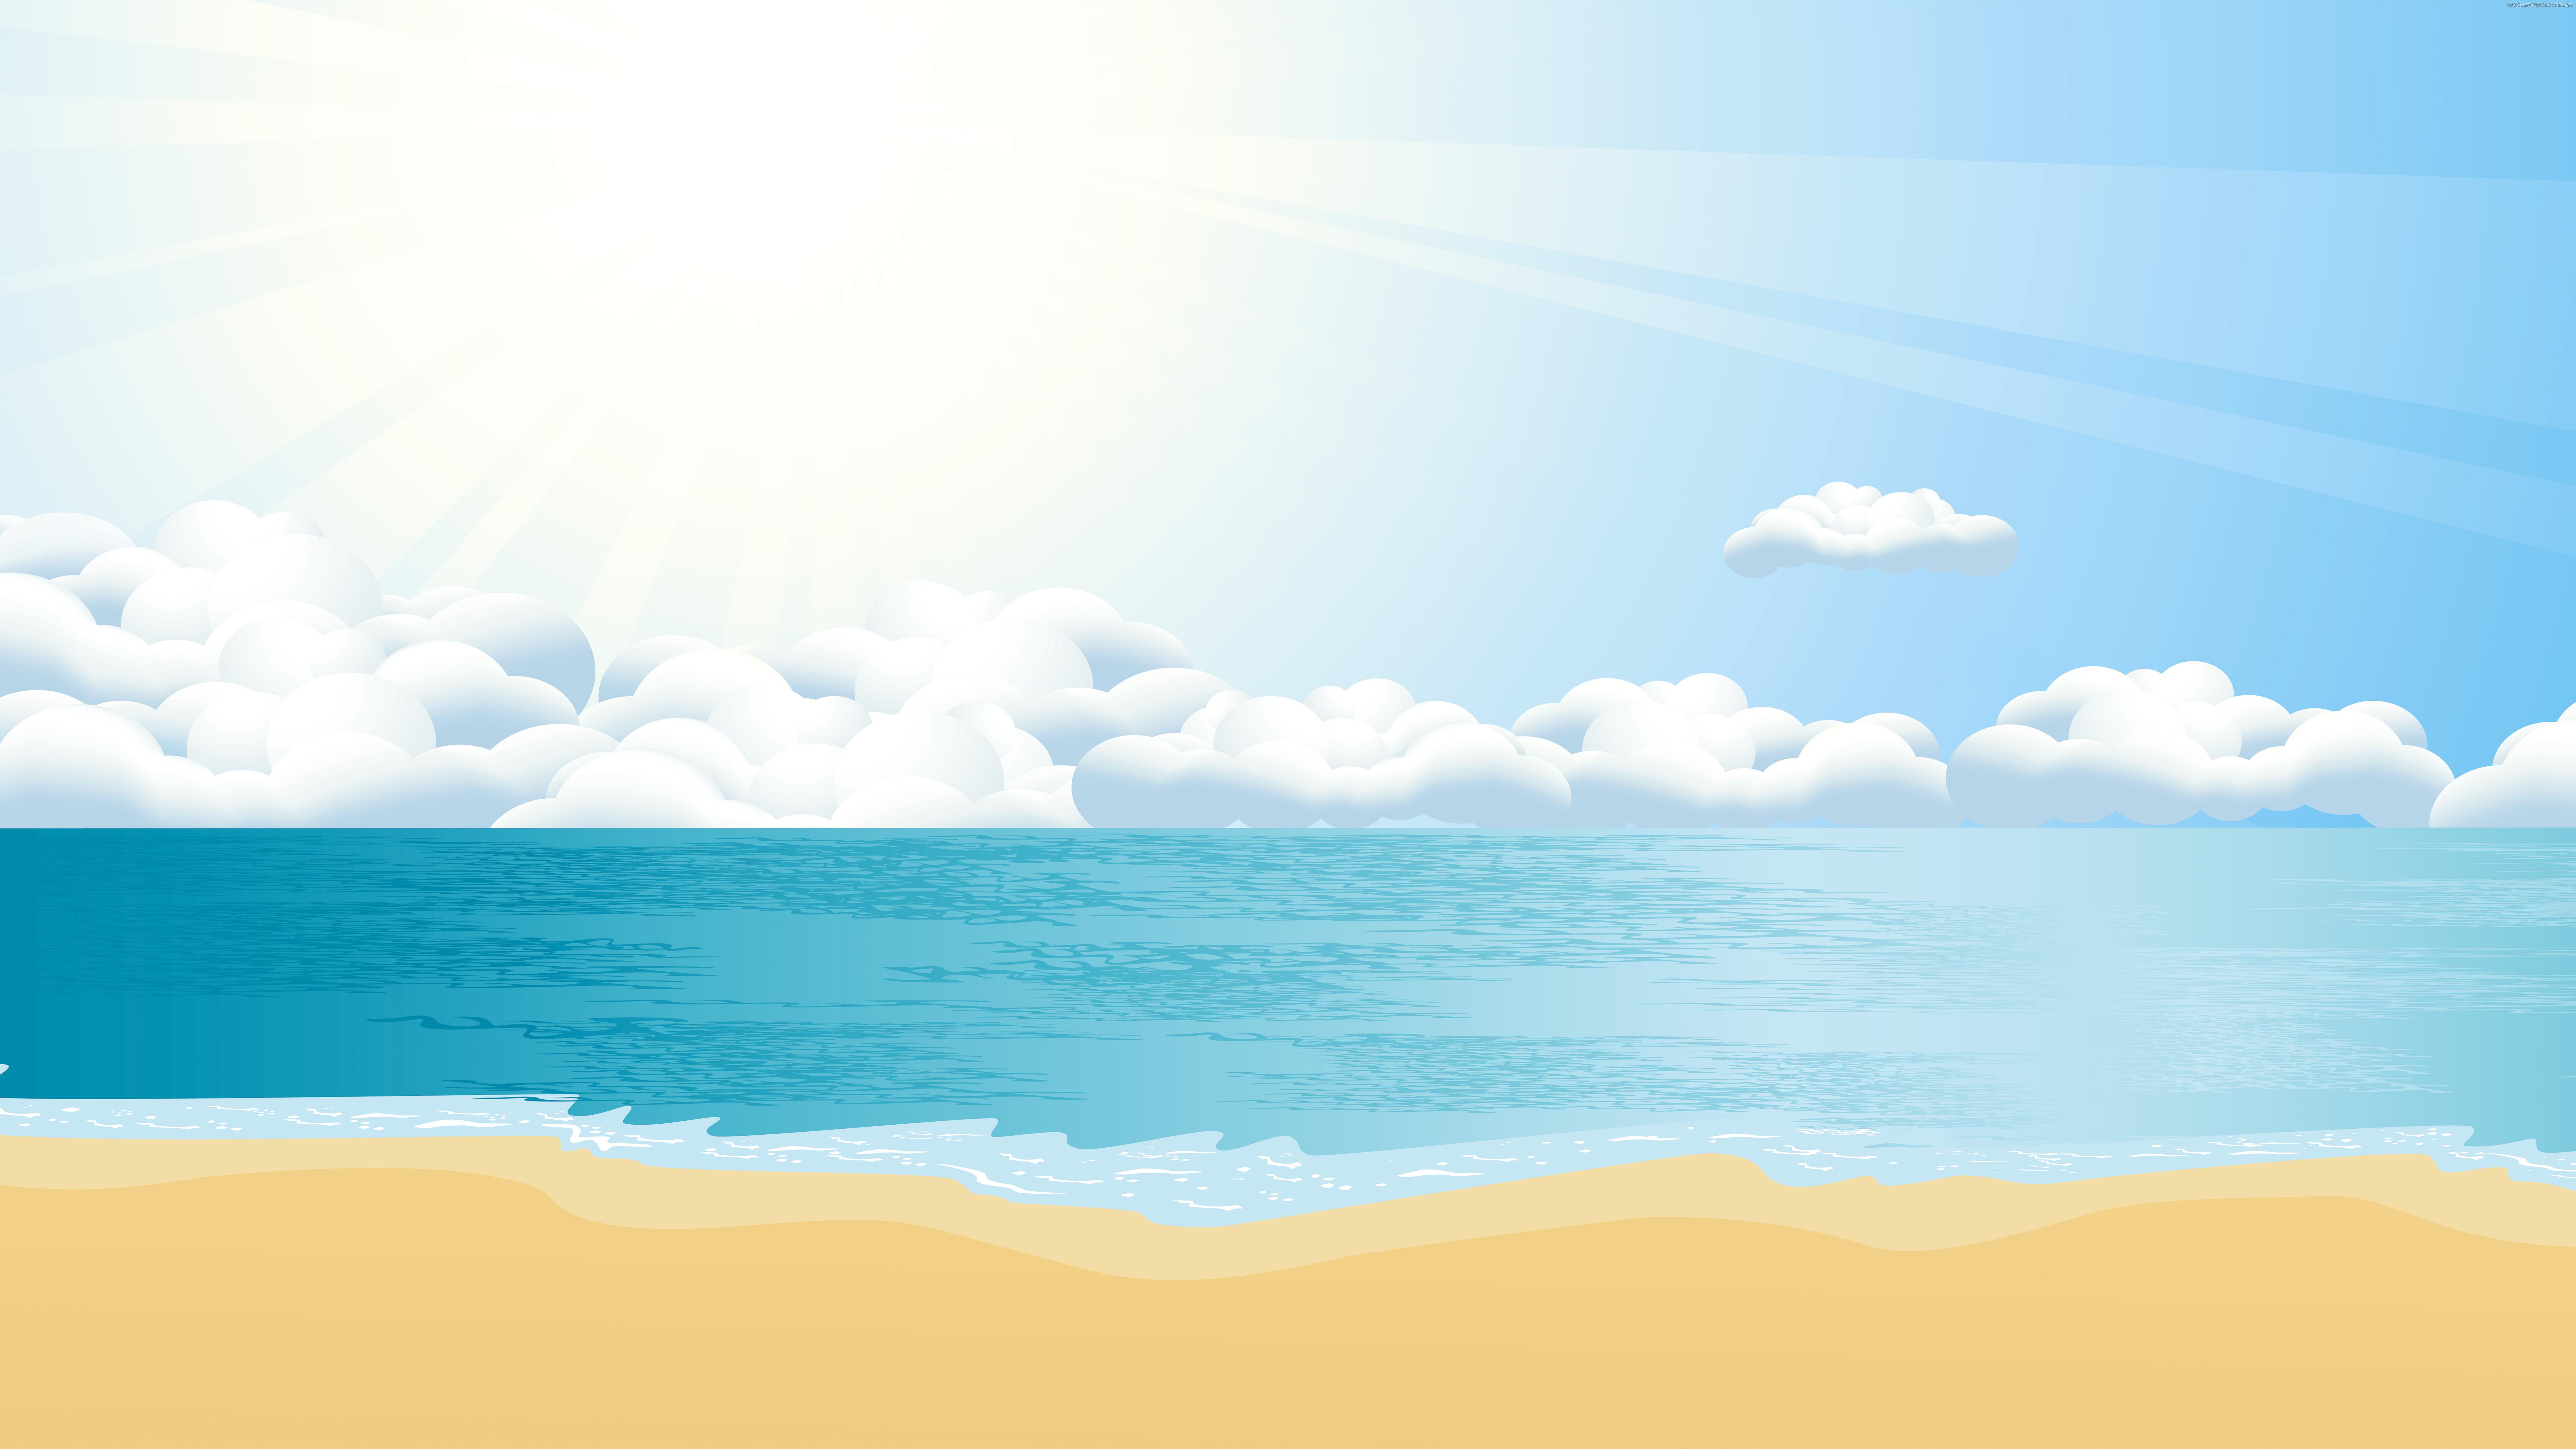 White Sand Beach 4k Hd Desktop Wallpaper For 4k Ultra Hd: 8K UHD Wallpaper